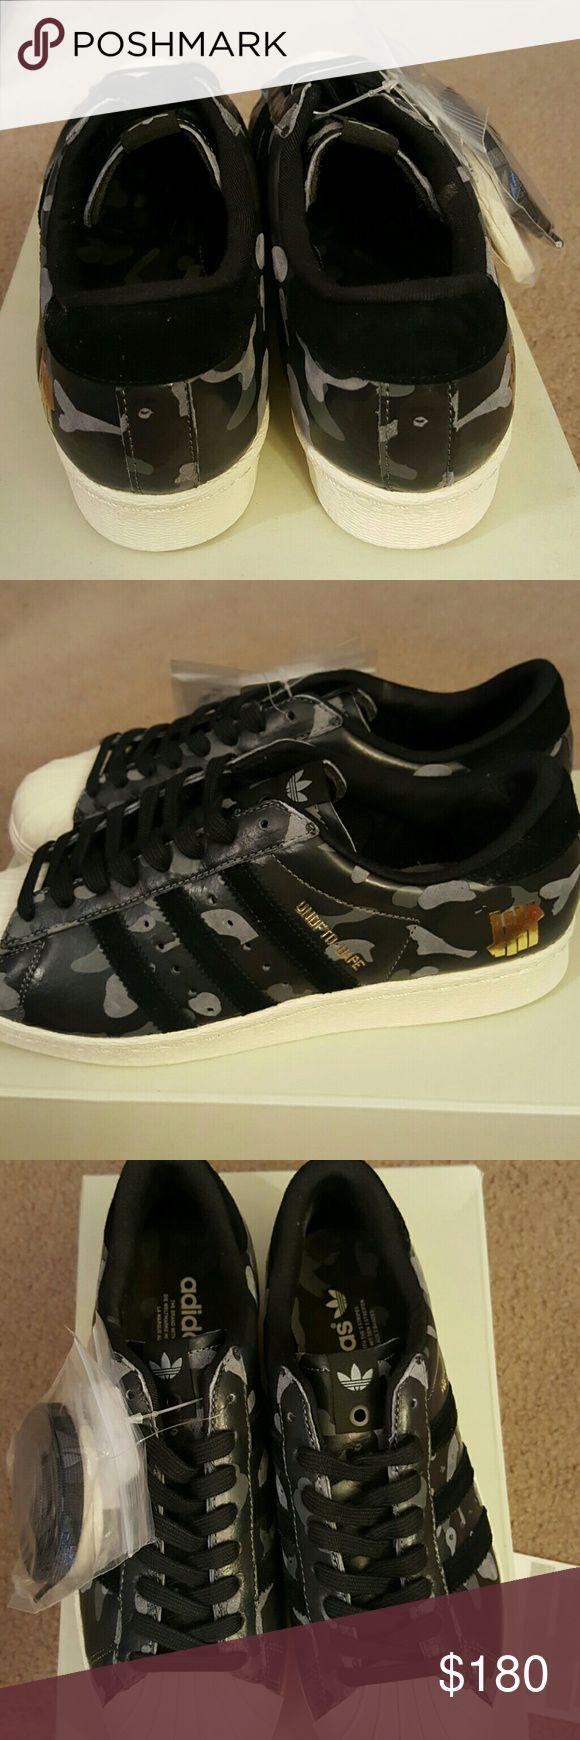 Men's Adidas Superstar Brand new Men's Adidas Superstar 80V UNDFTD-BAPE Black Camo, Limited edition Adidas  Shoes Athletic Shoes